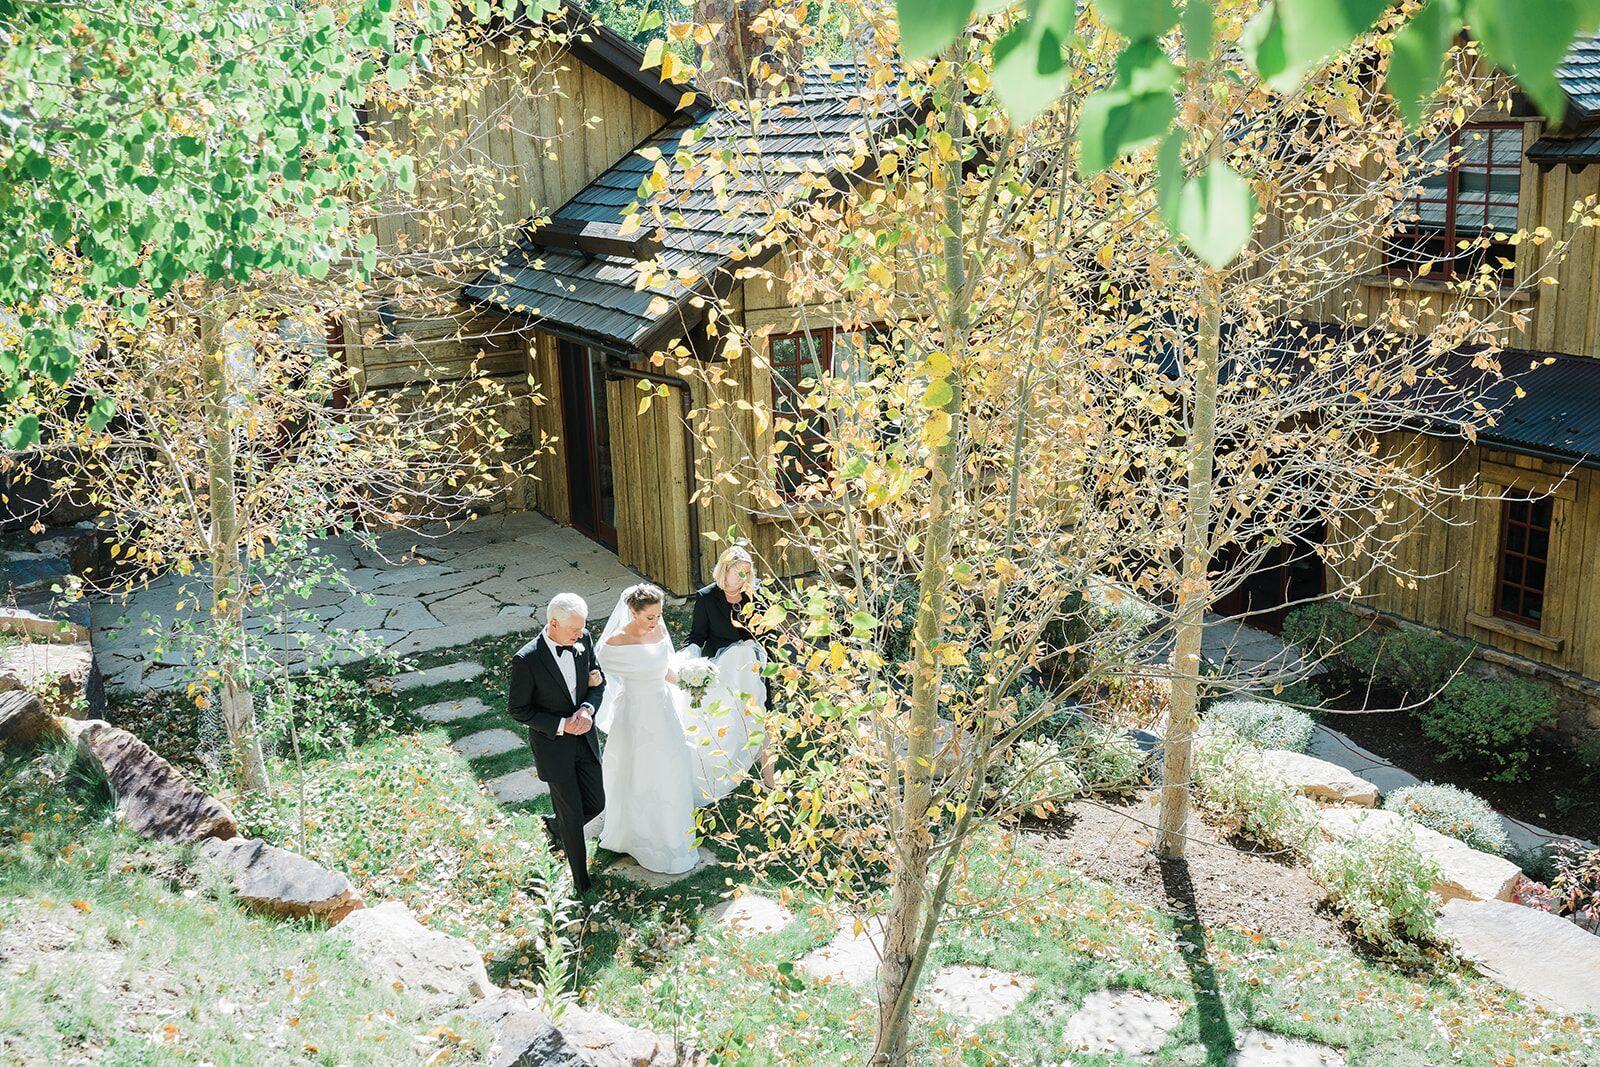 The Cape Lela Rose, Lela Rose, Little White Dress Denver CO, Vail Wedding Dress, The 10th Wedding Vail, Edwards CO wedding